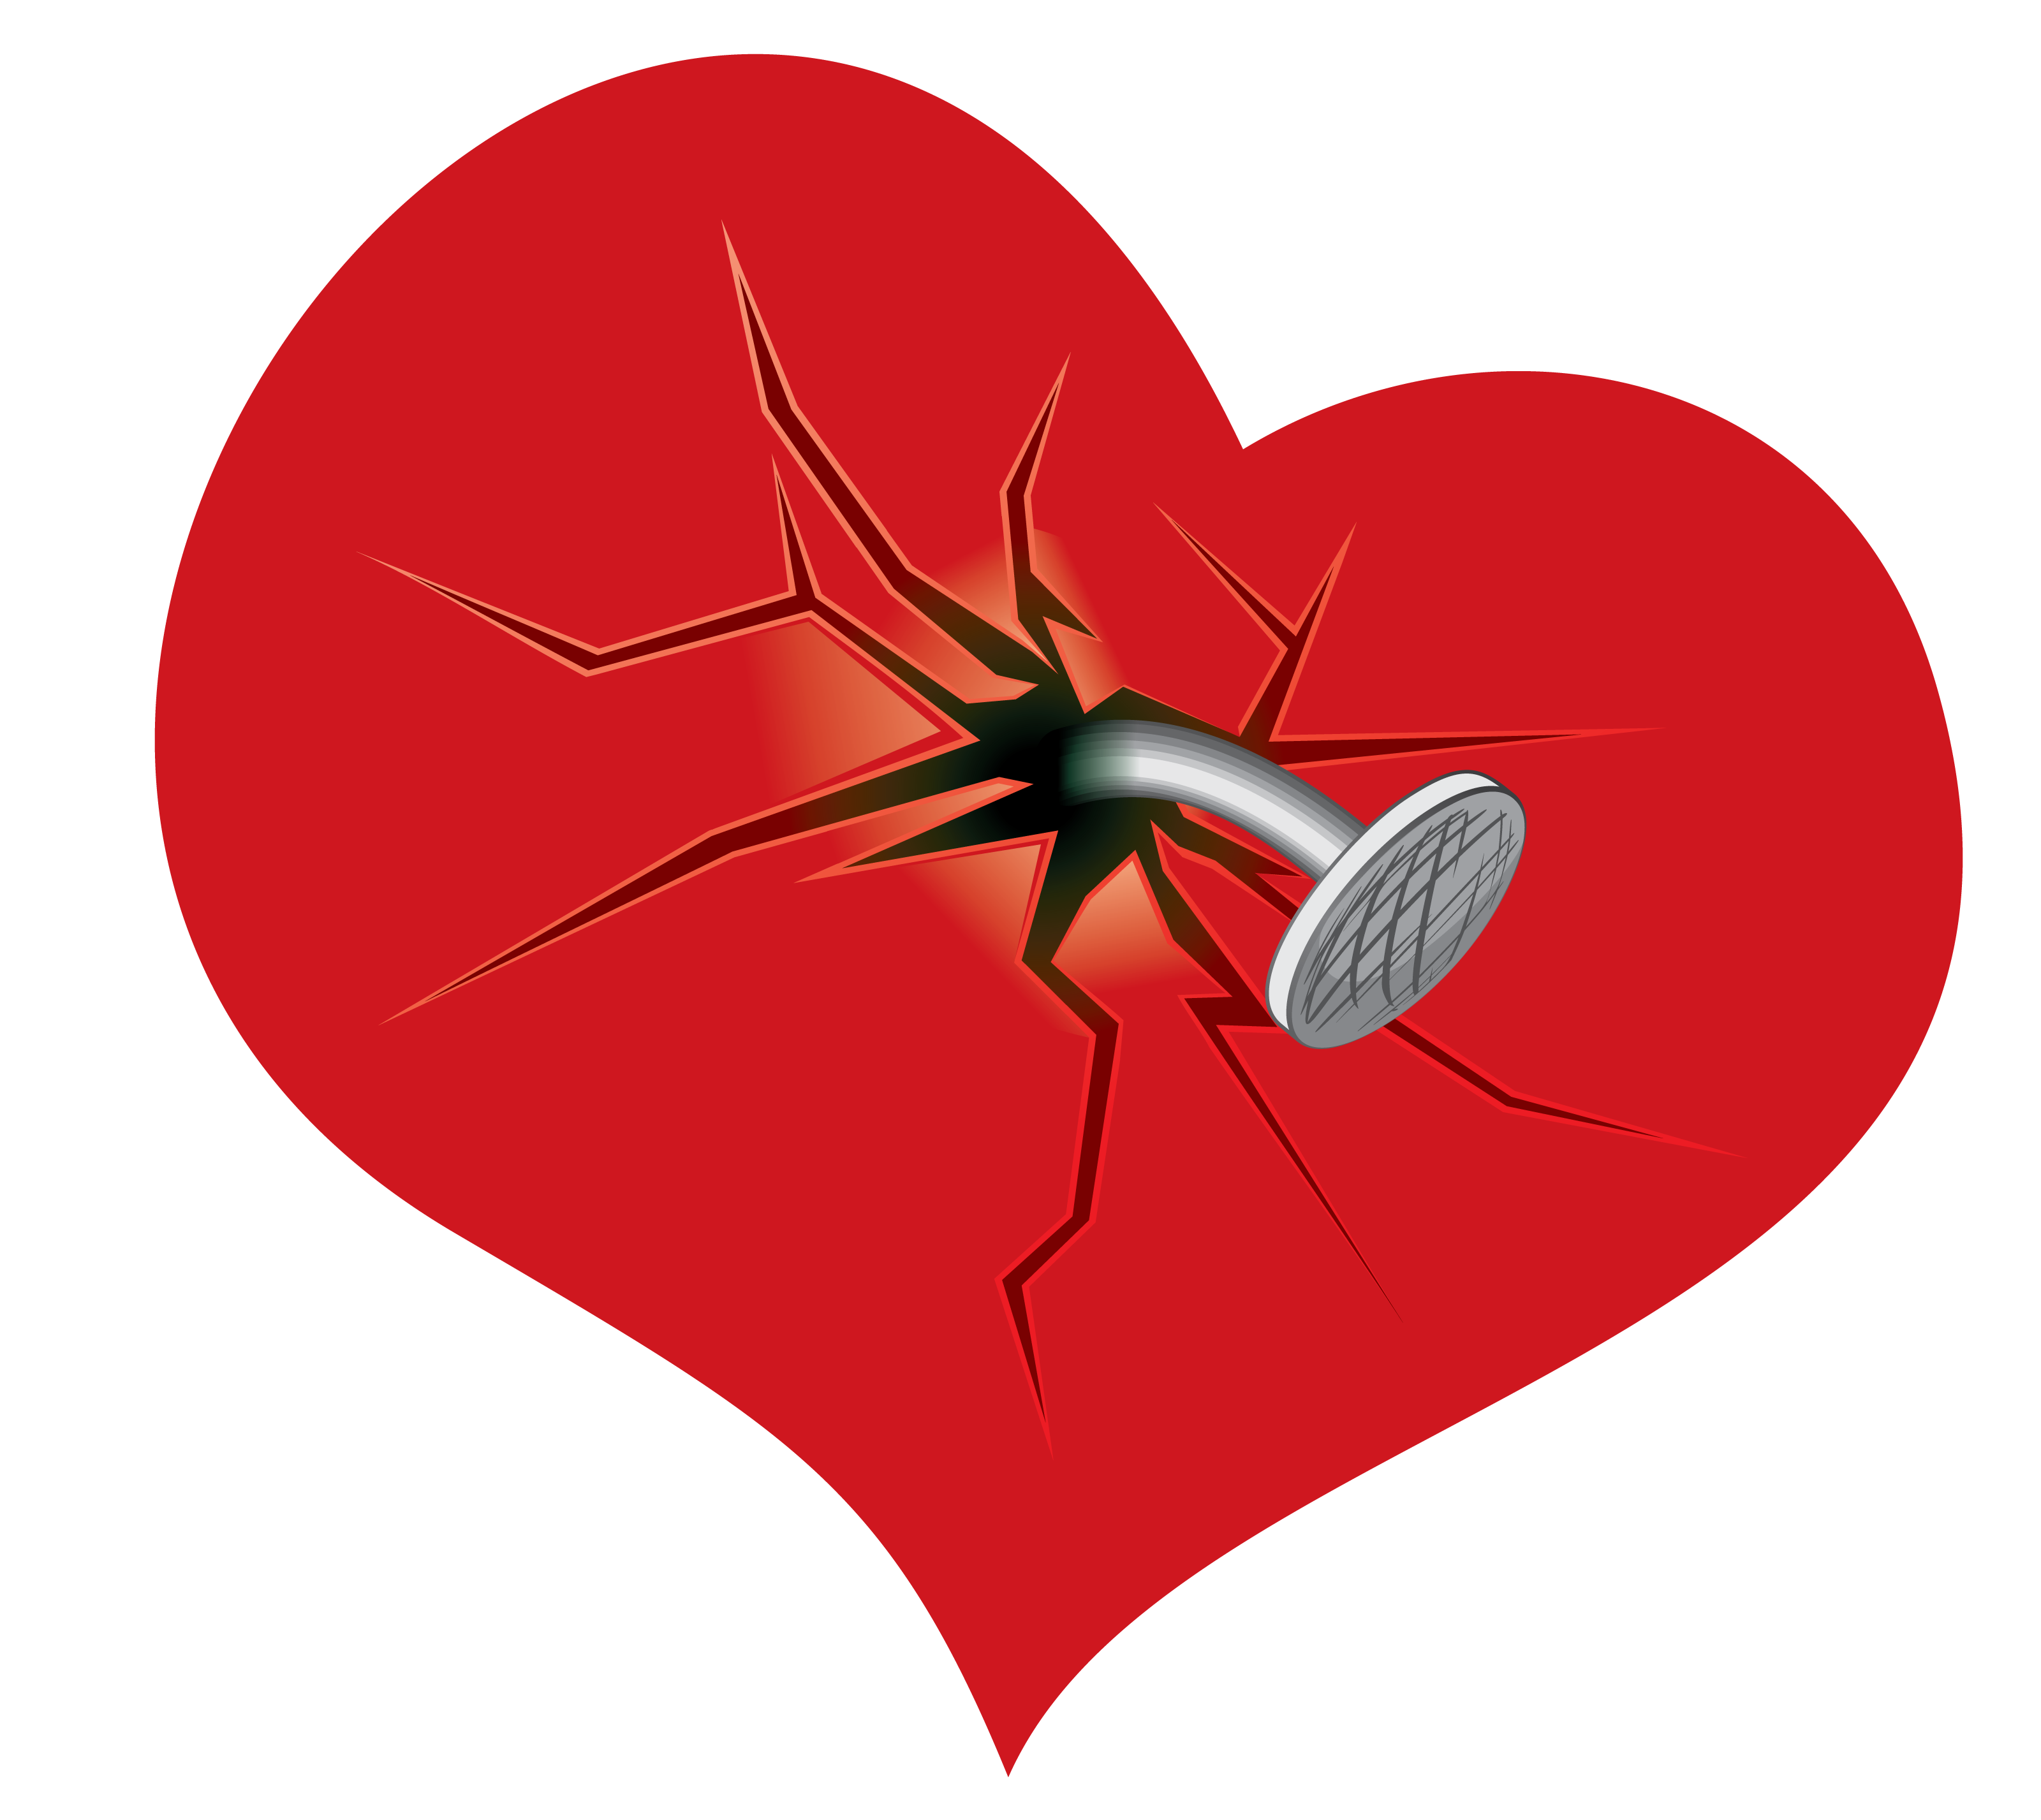 Broken heart clip art. Hearts png images